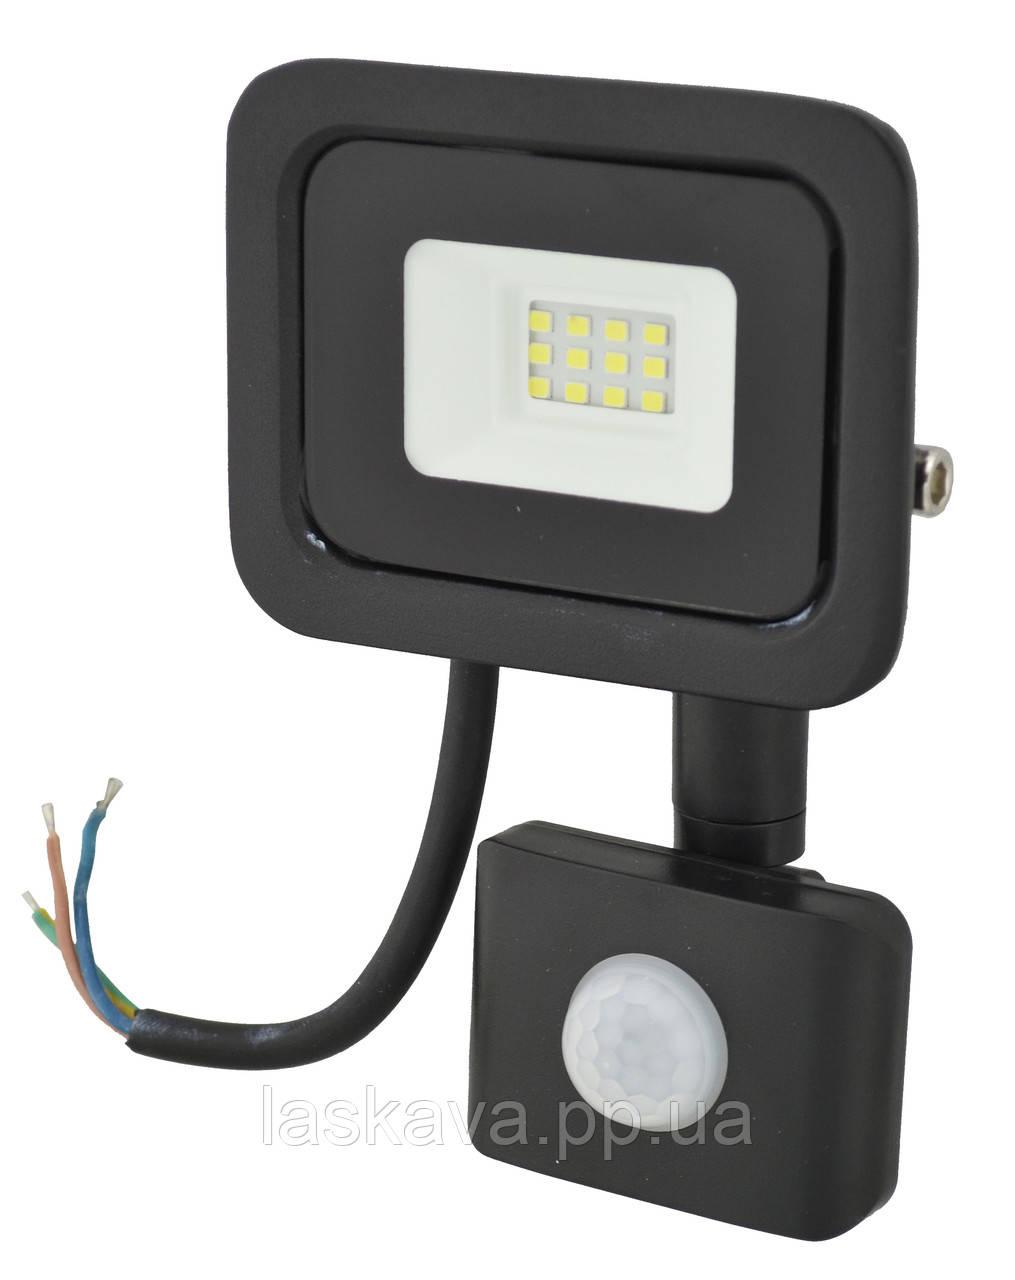 Прожектор LED c датчиком движения Ritar RT- FLOOD/MS 10A 10W IP65 1000Lm Black (01202) Siamo